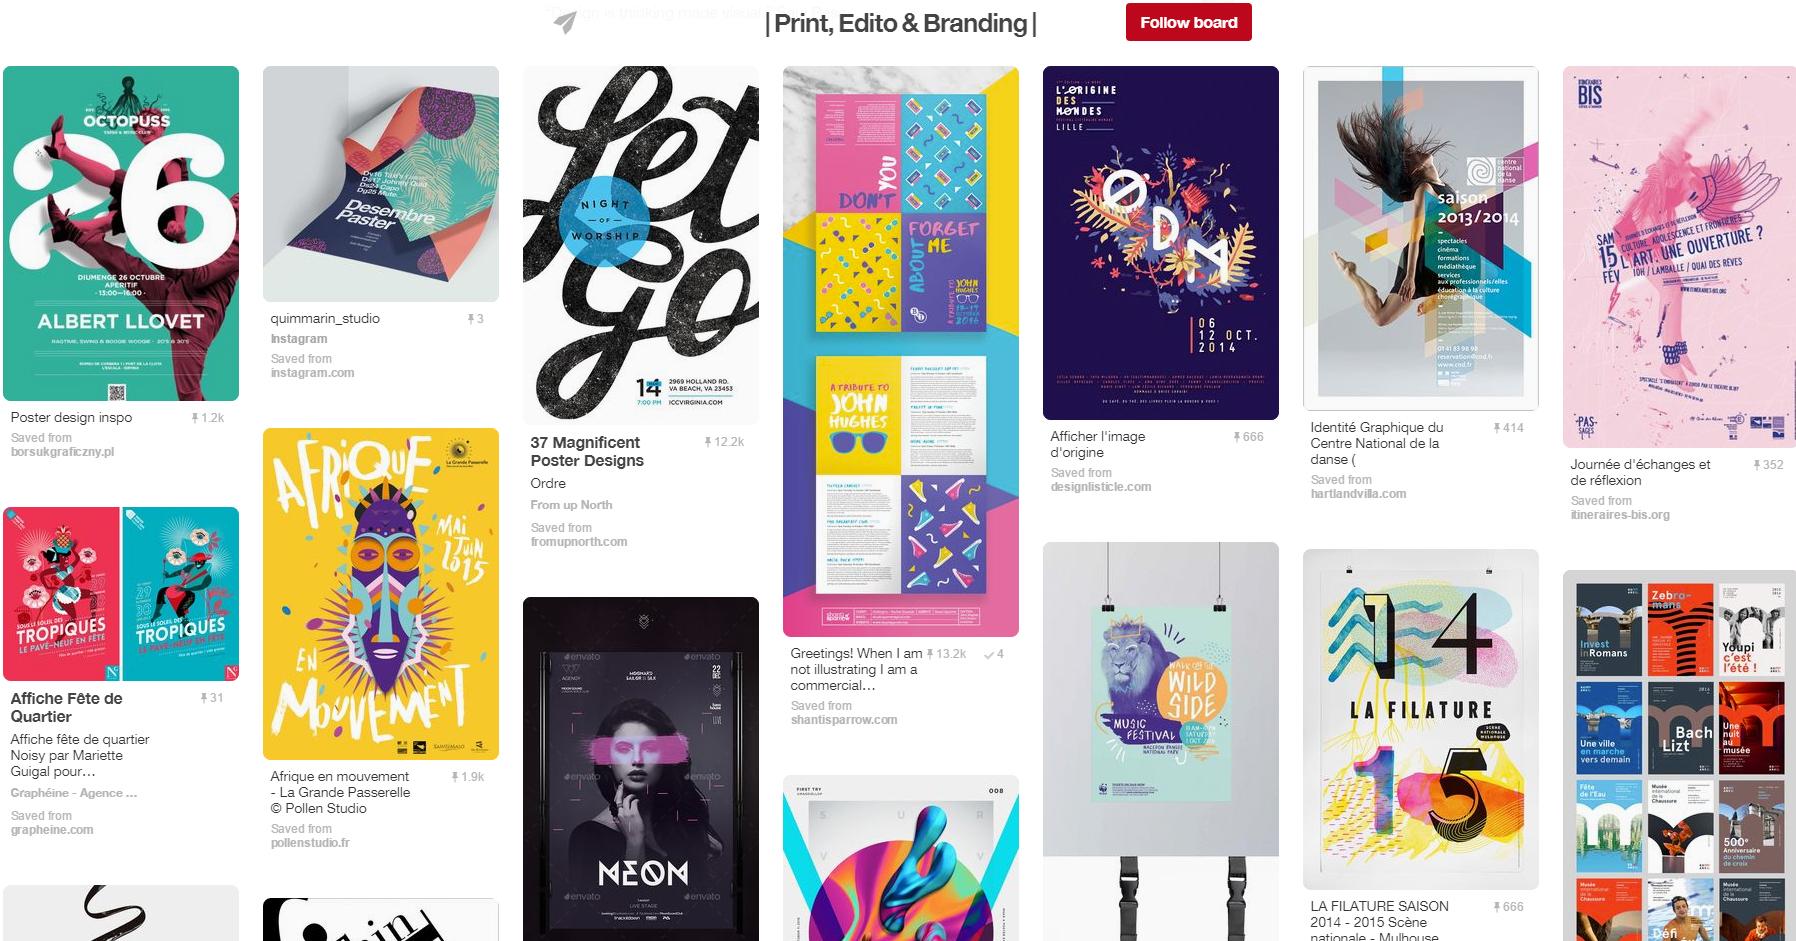 print-edito-branding-pinterest-board